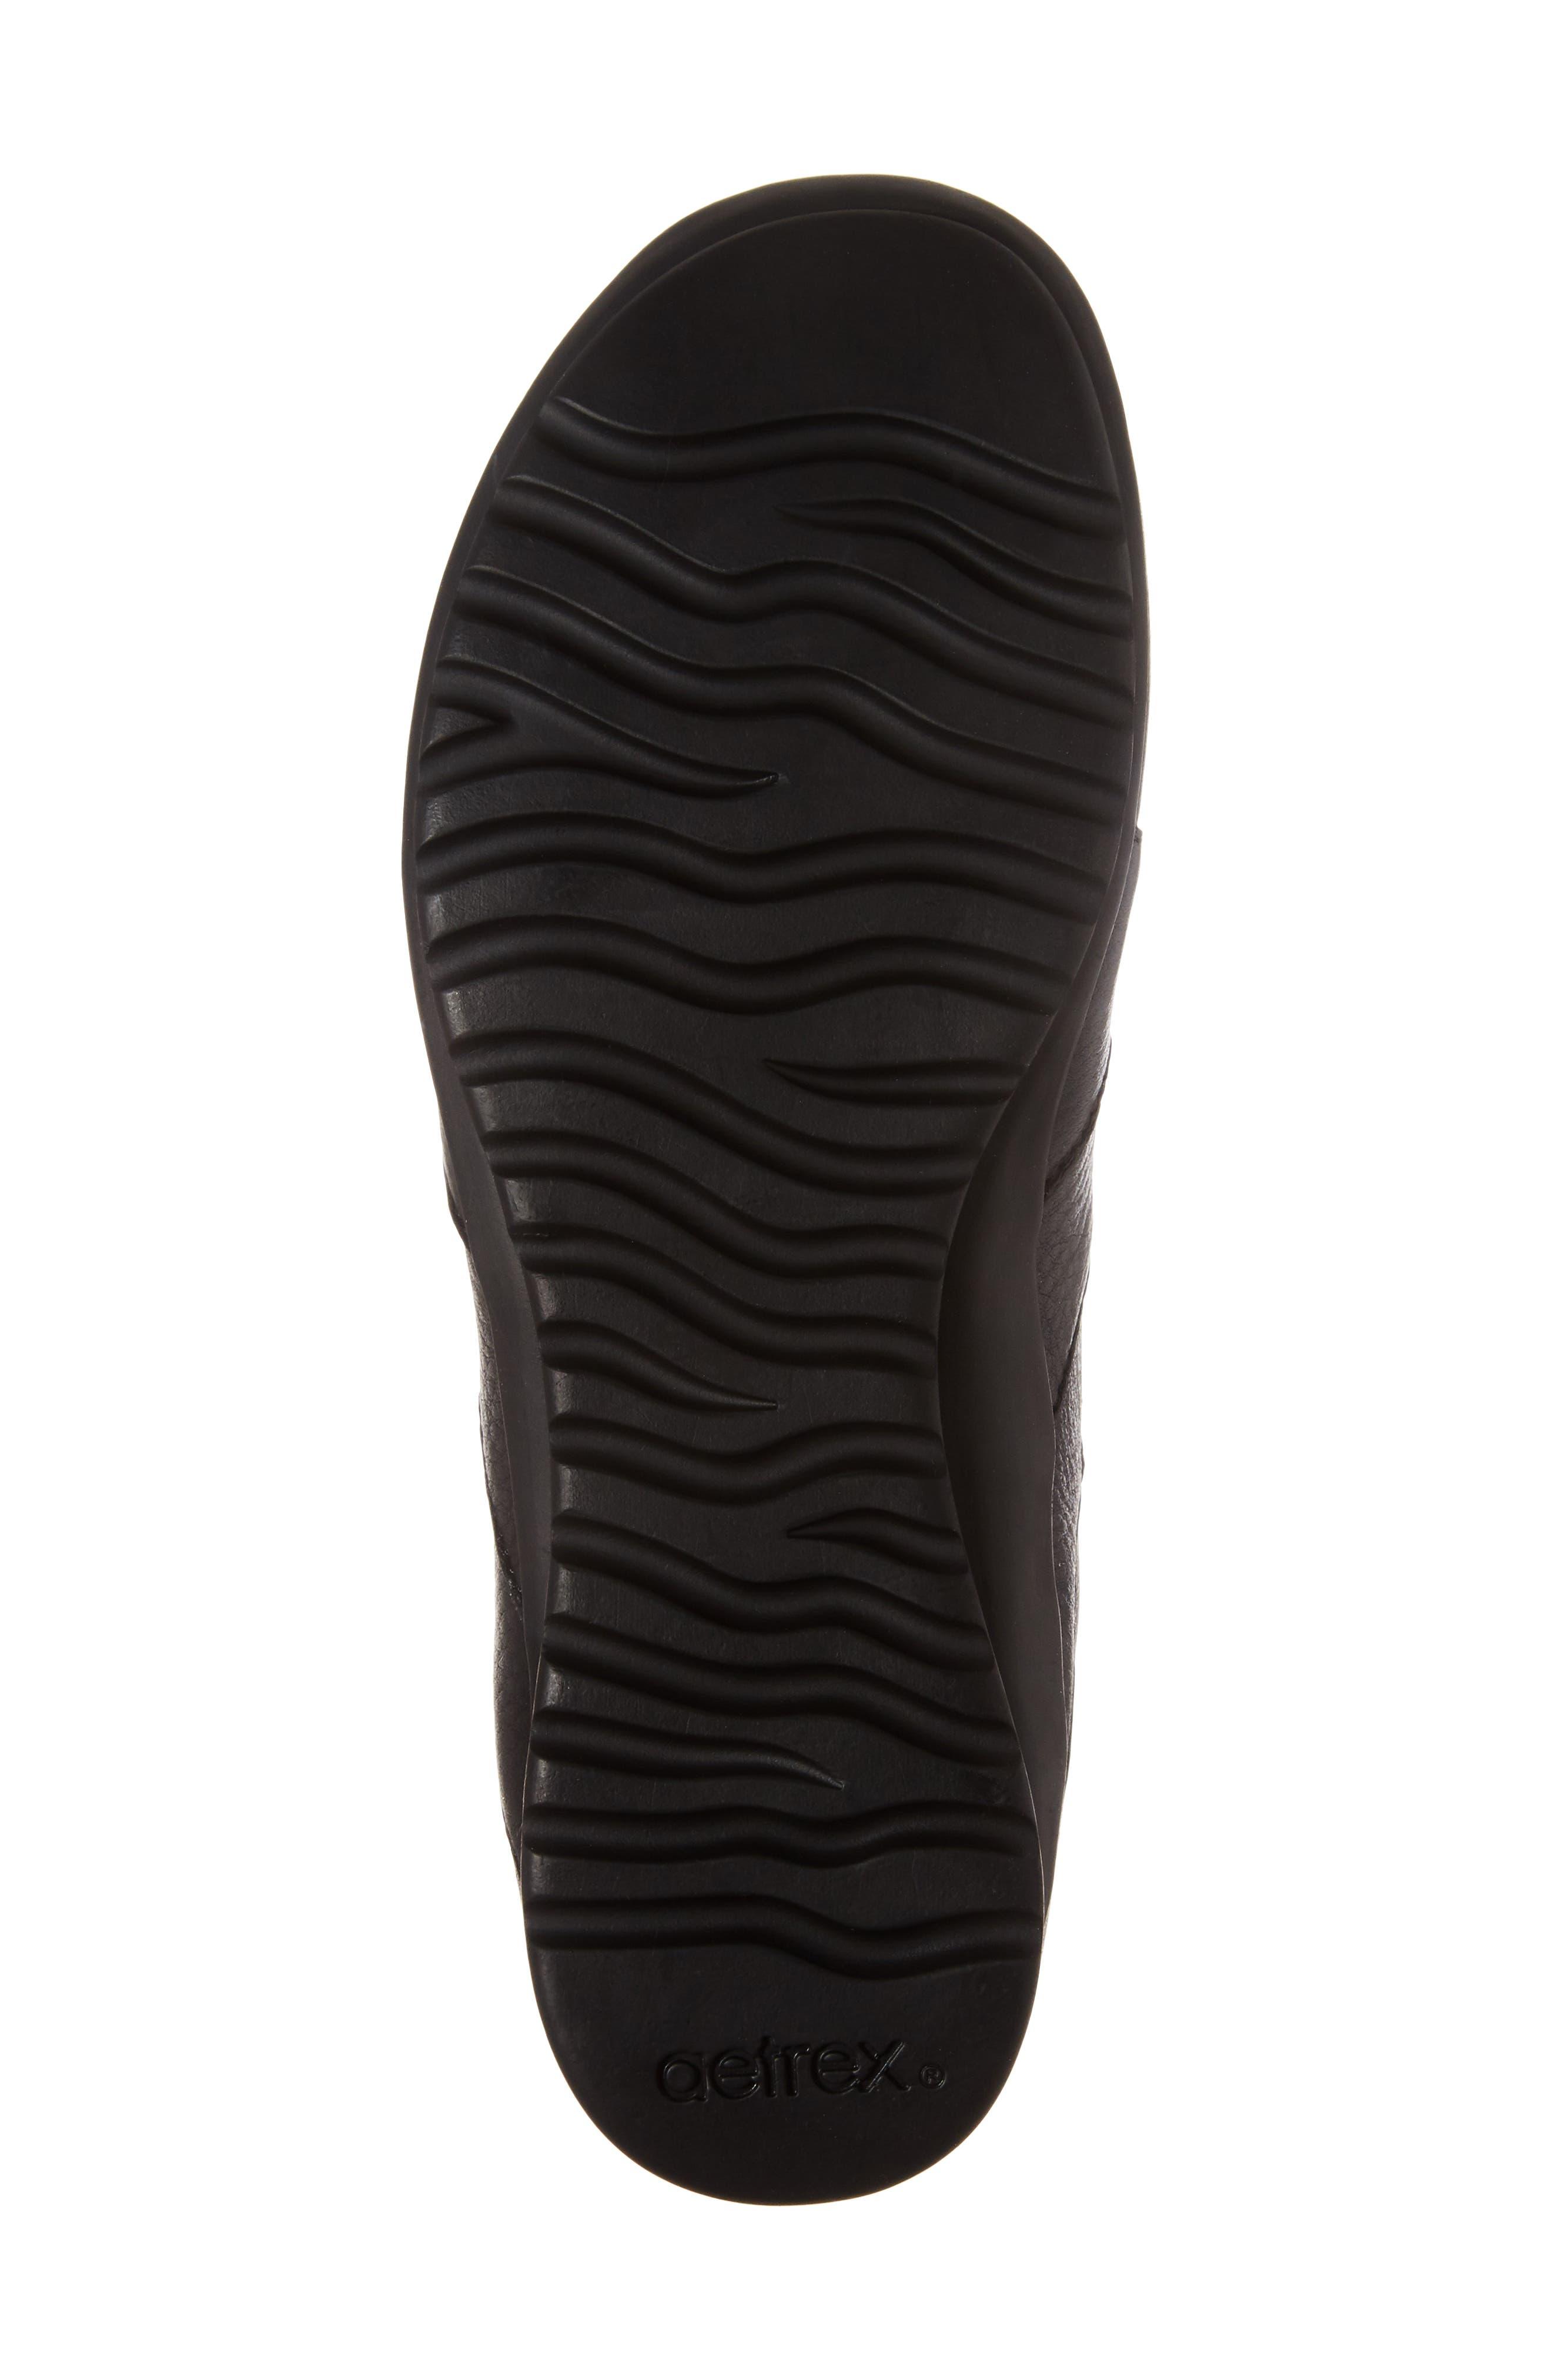 Sienna Cutout Sneaker,                             Alternate thumbnail 6, color,                             BLACK LEATHER/ BLACK